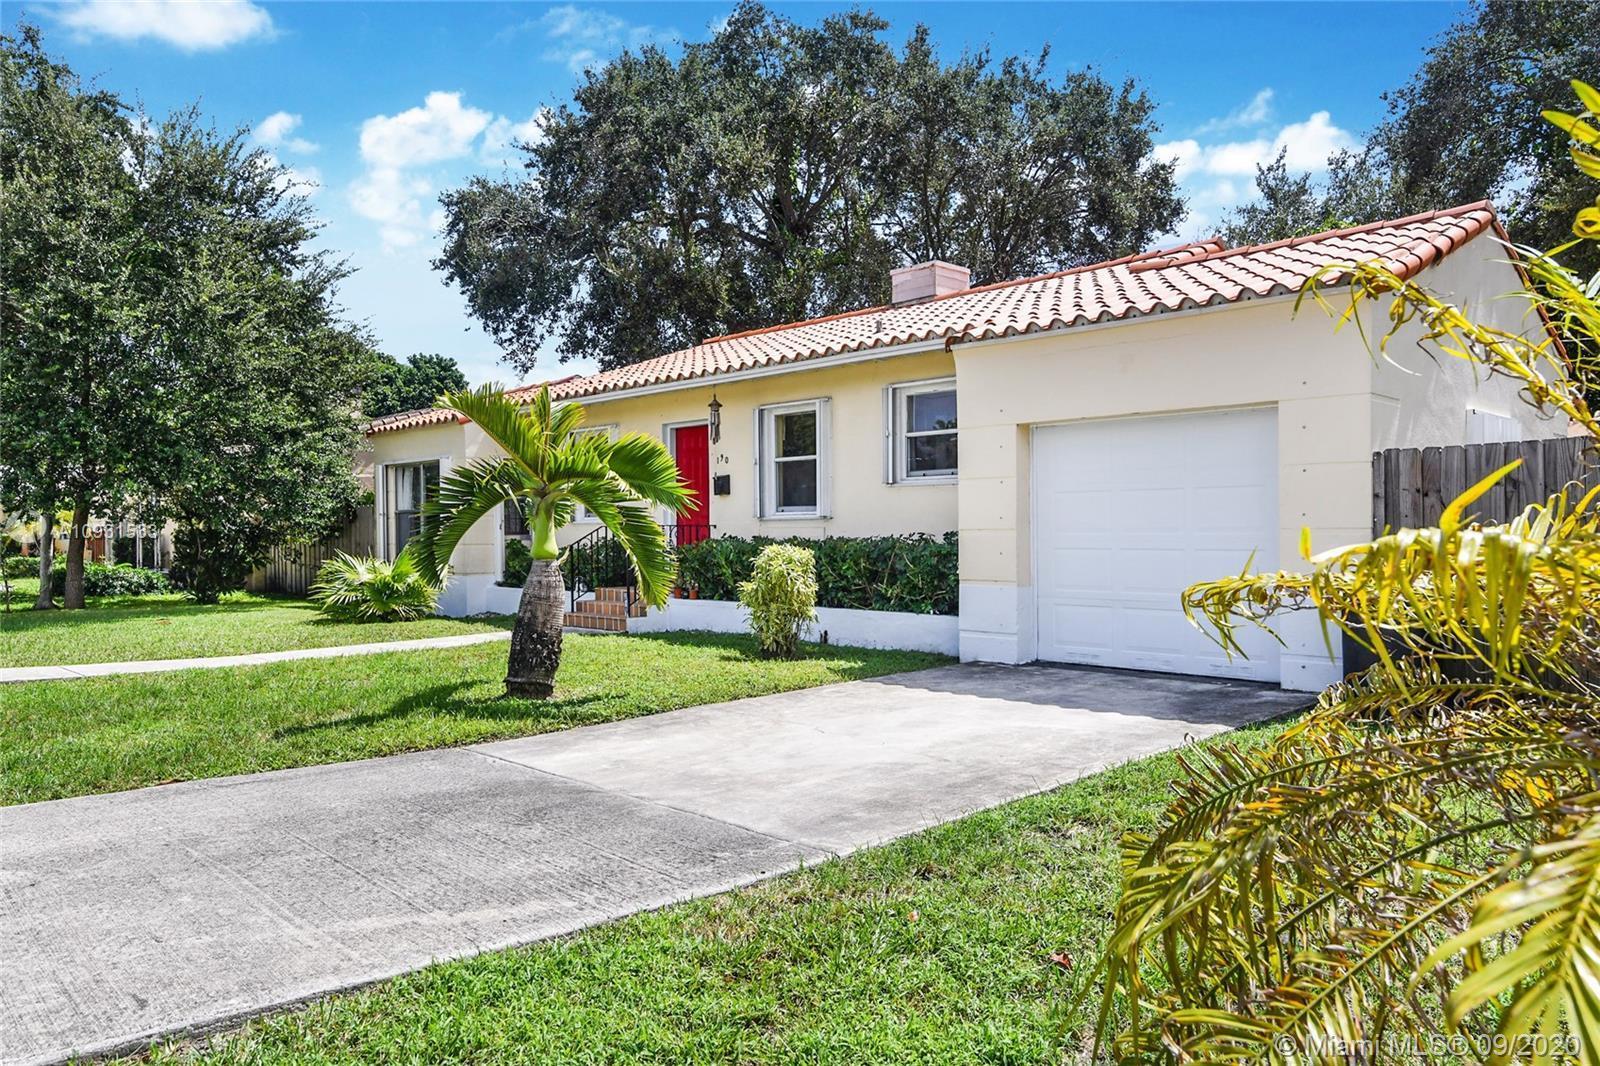 190 NW 103rd St, Miami Shores, FL, 33150